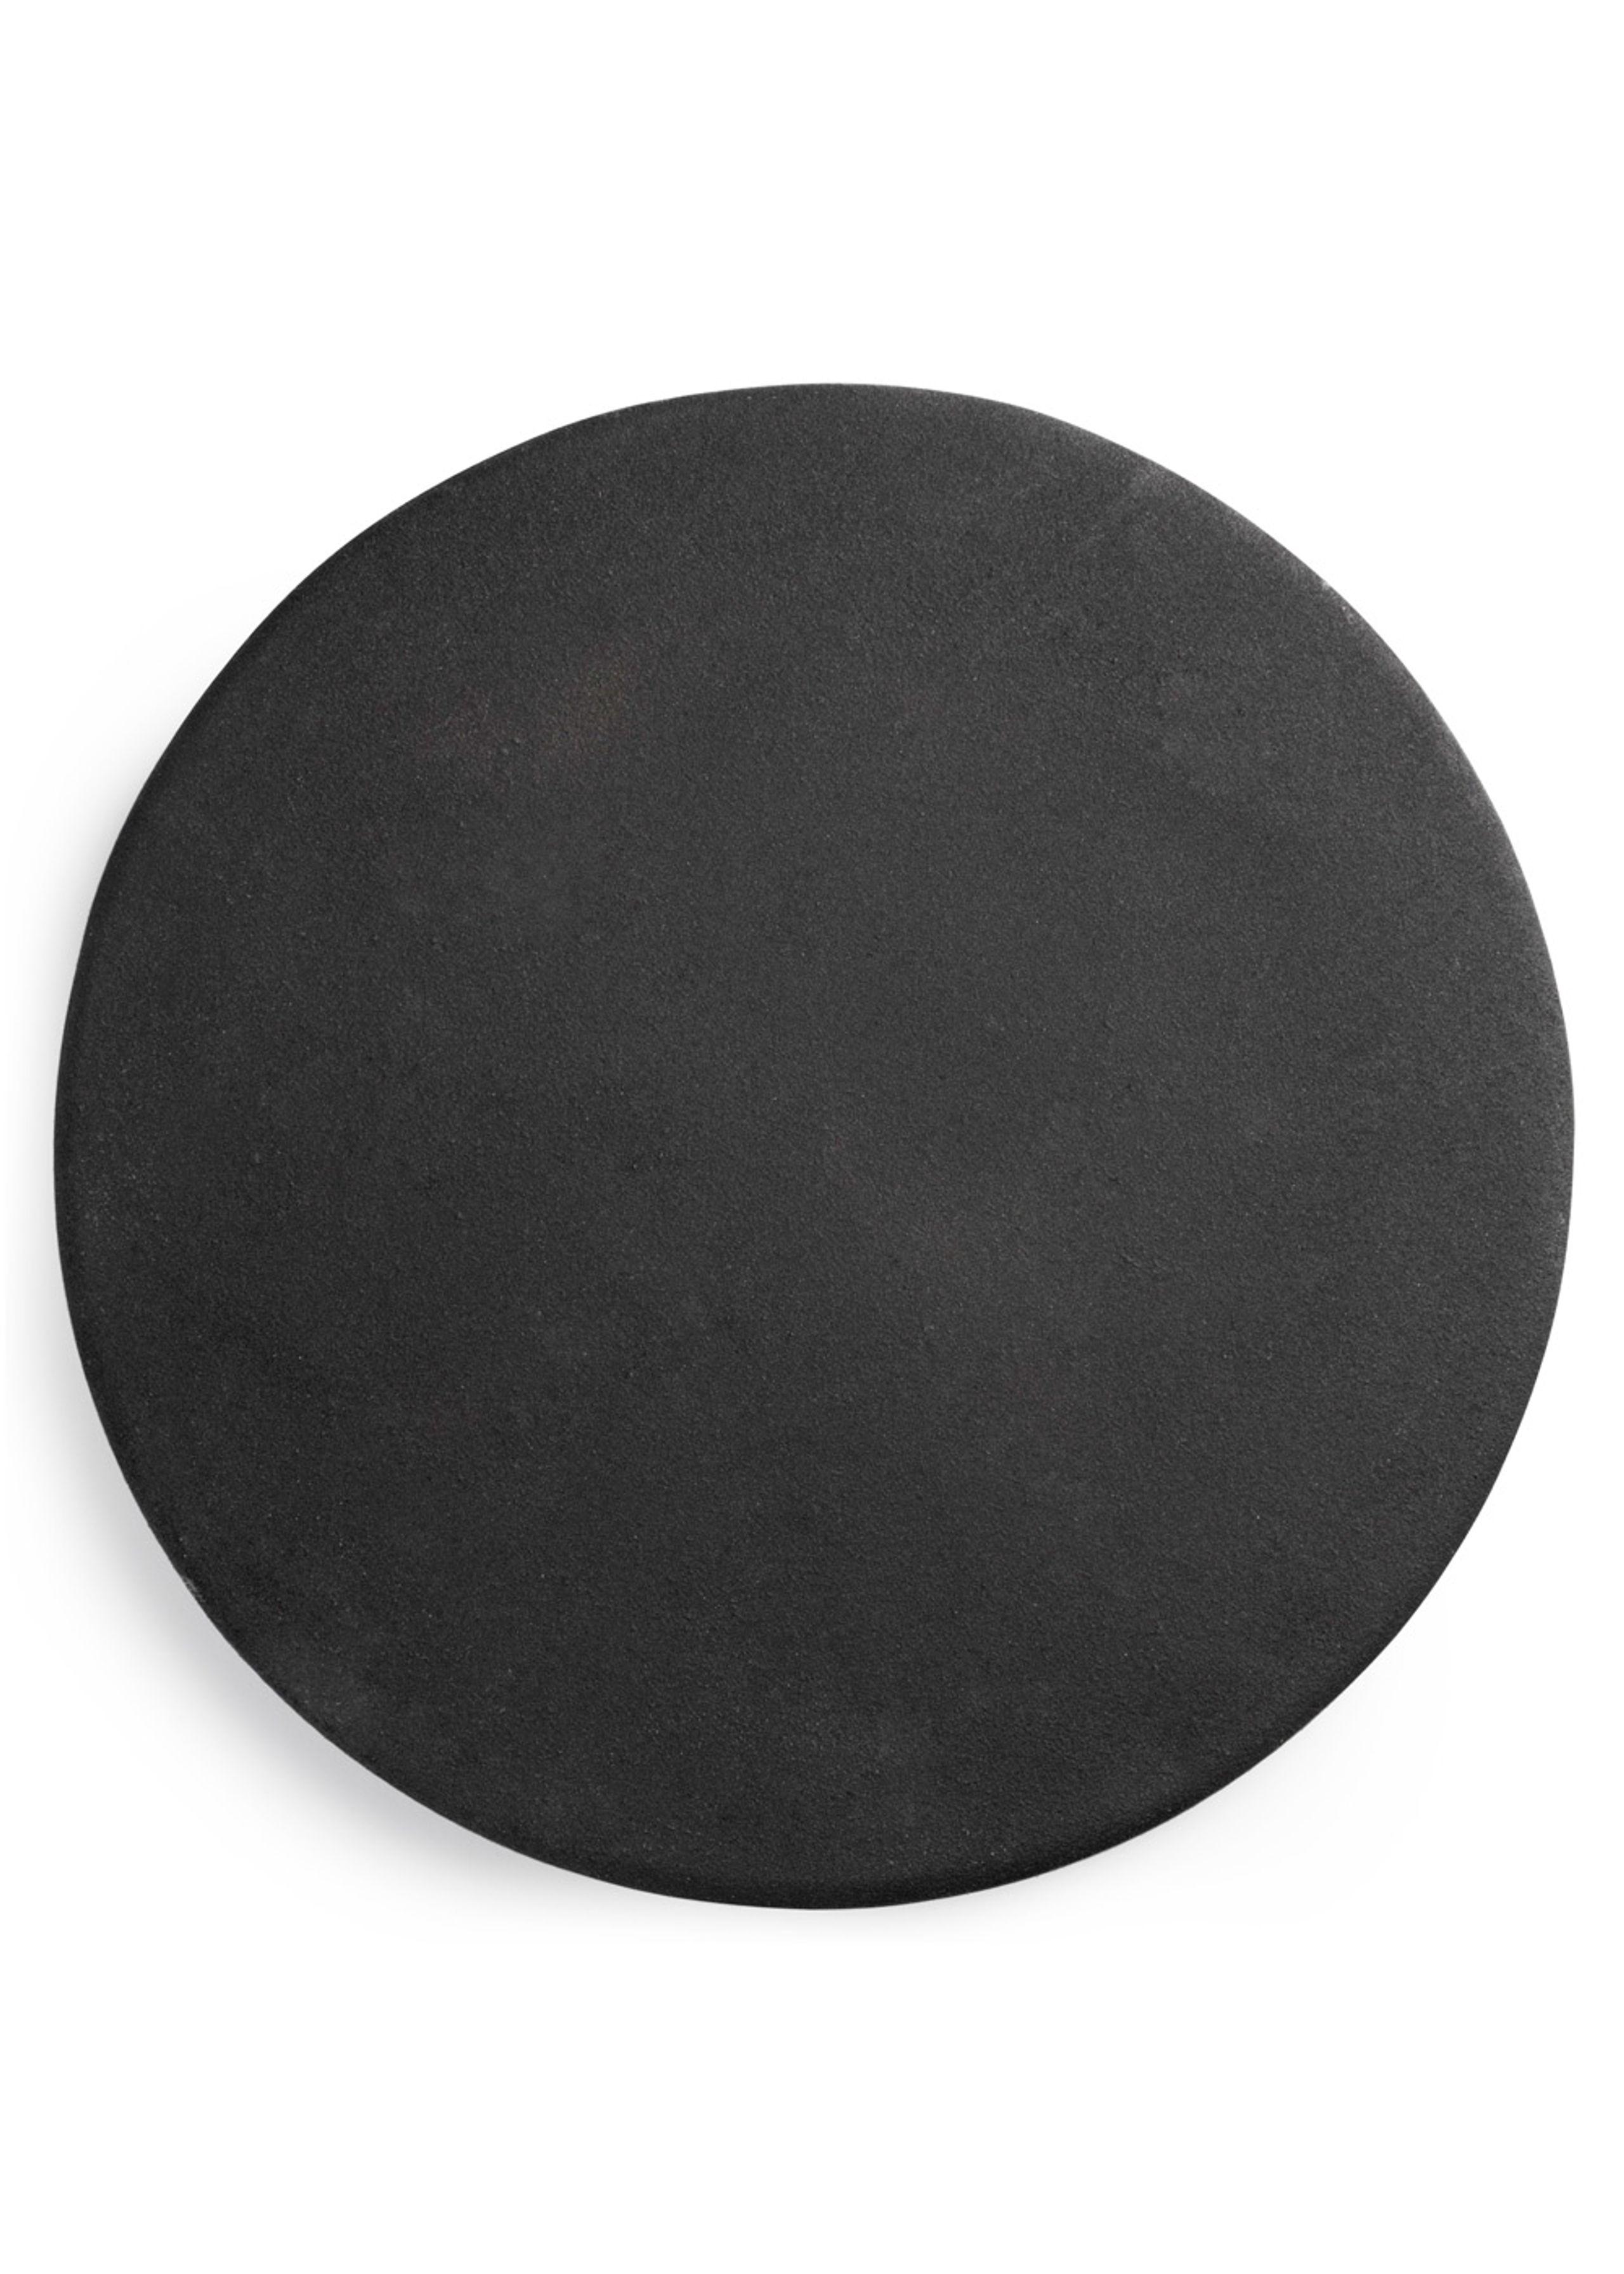 Image of   Heima Plate